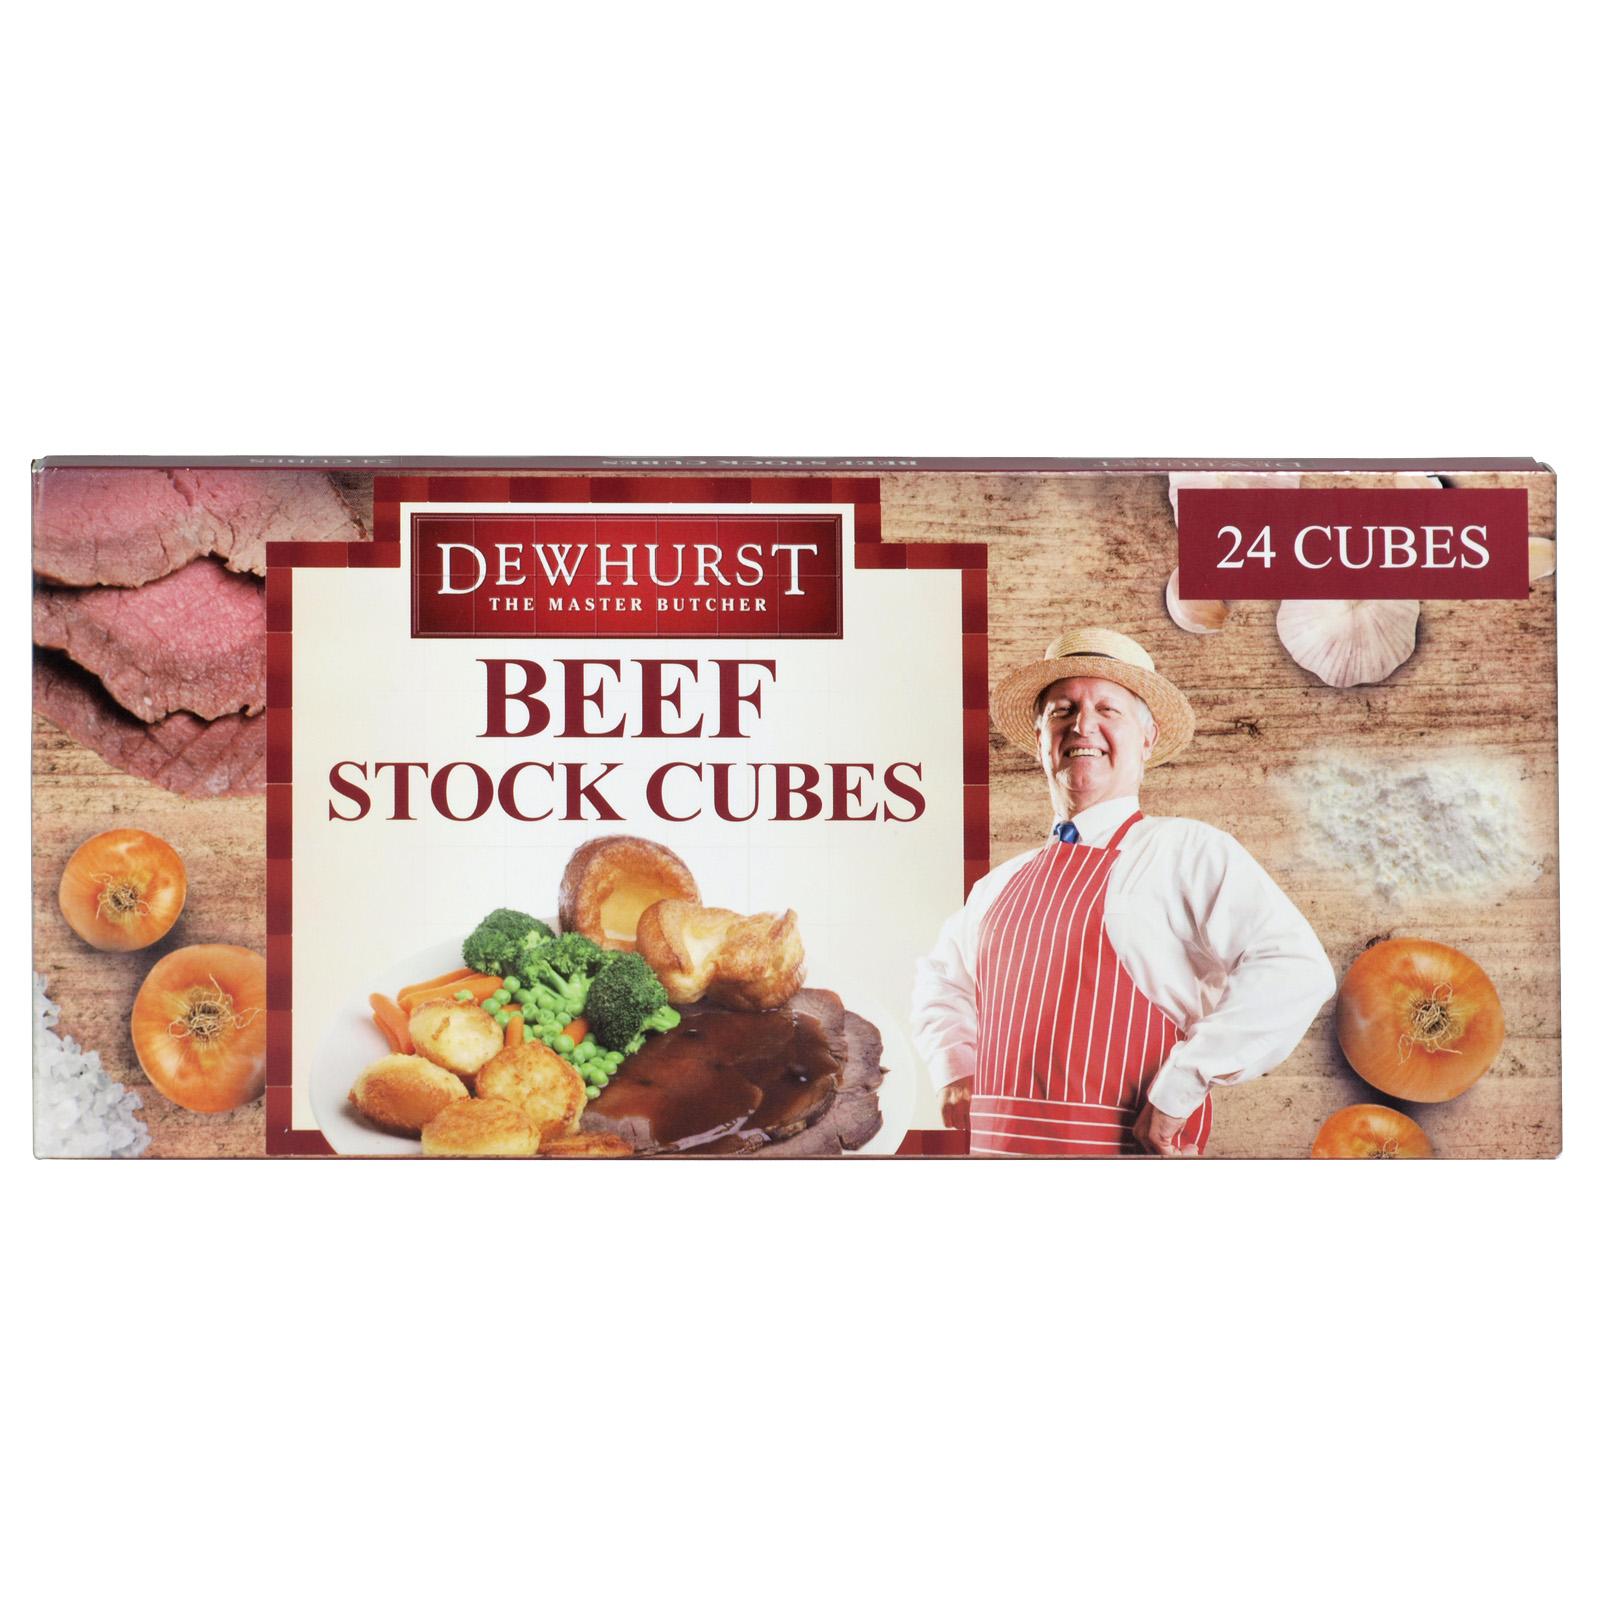 DEWHURST BEEF STOCK CUBES 24S X6